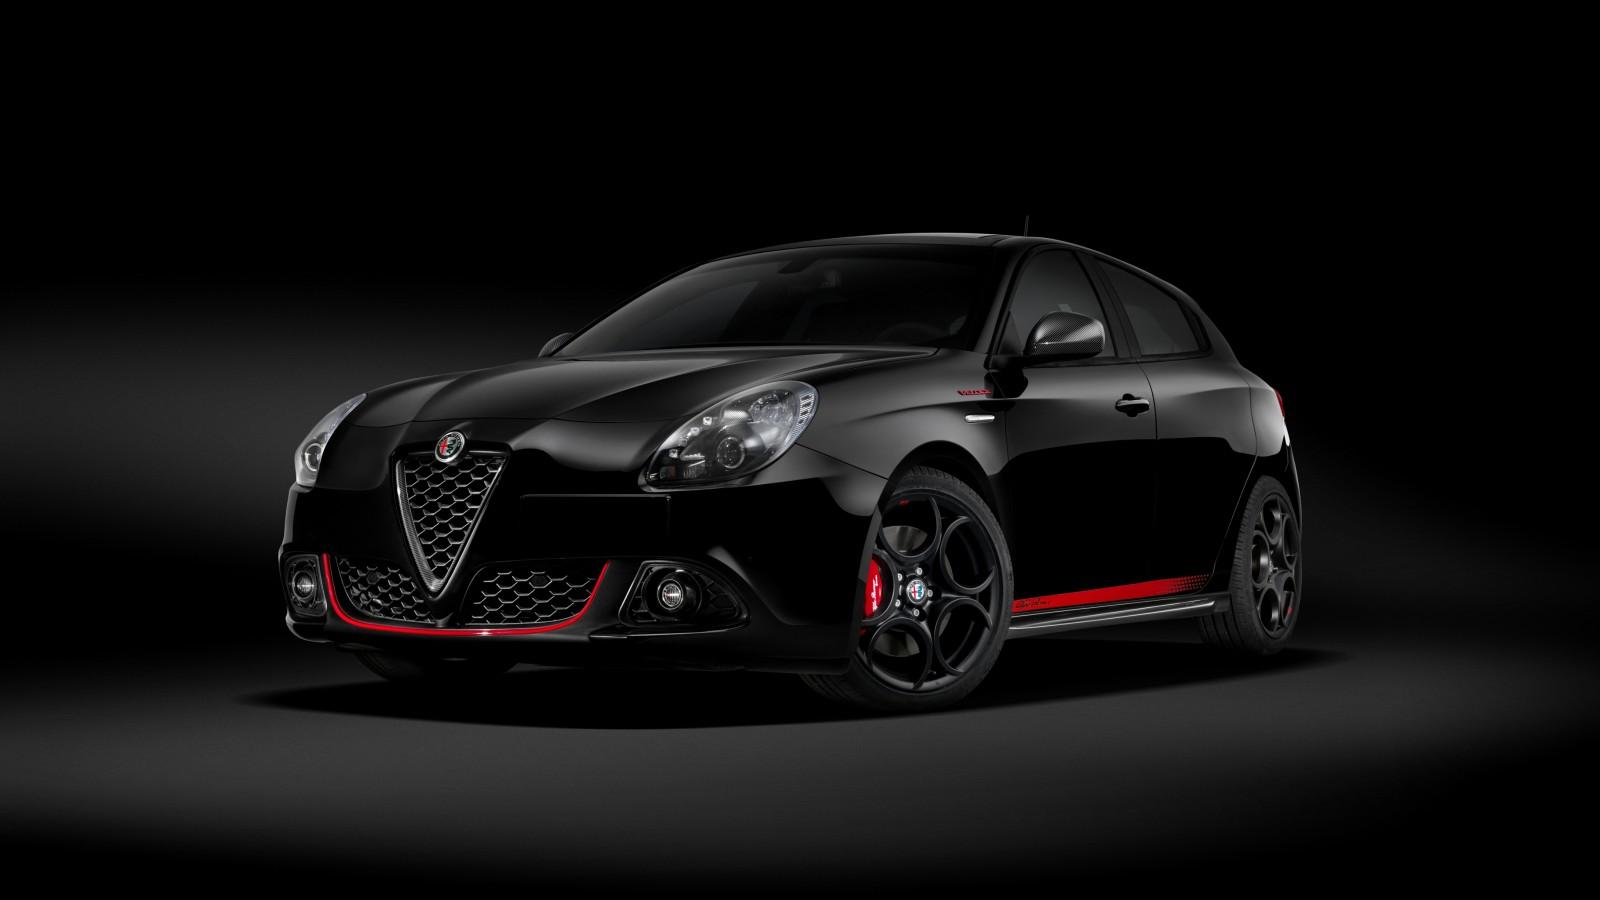 2018 Alfa Romeo Giulietta Veloce 4K Wallpaper | HD Car ...